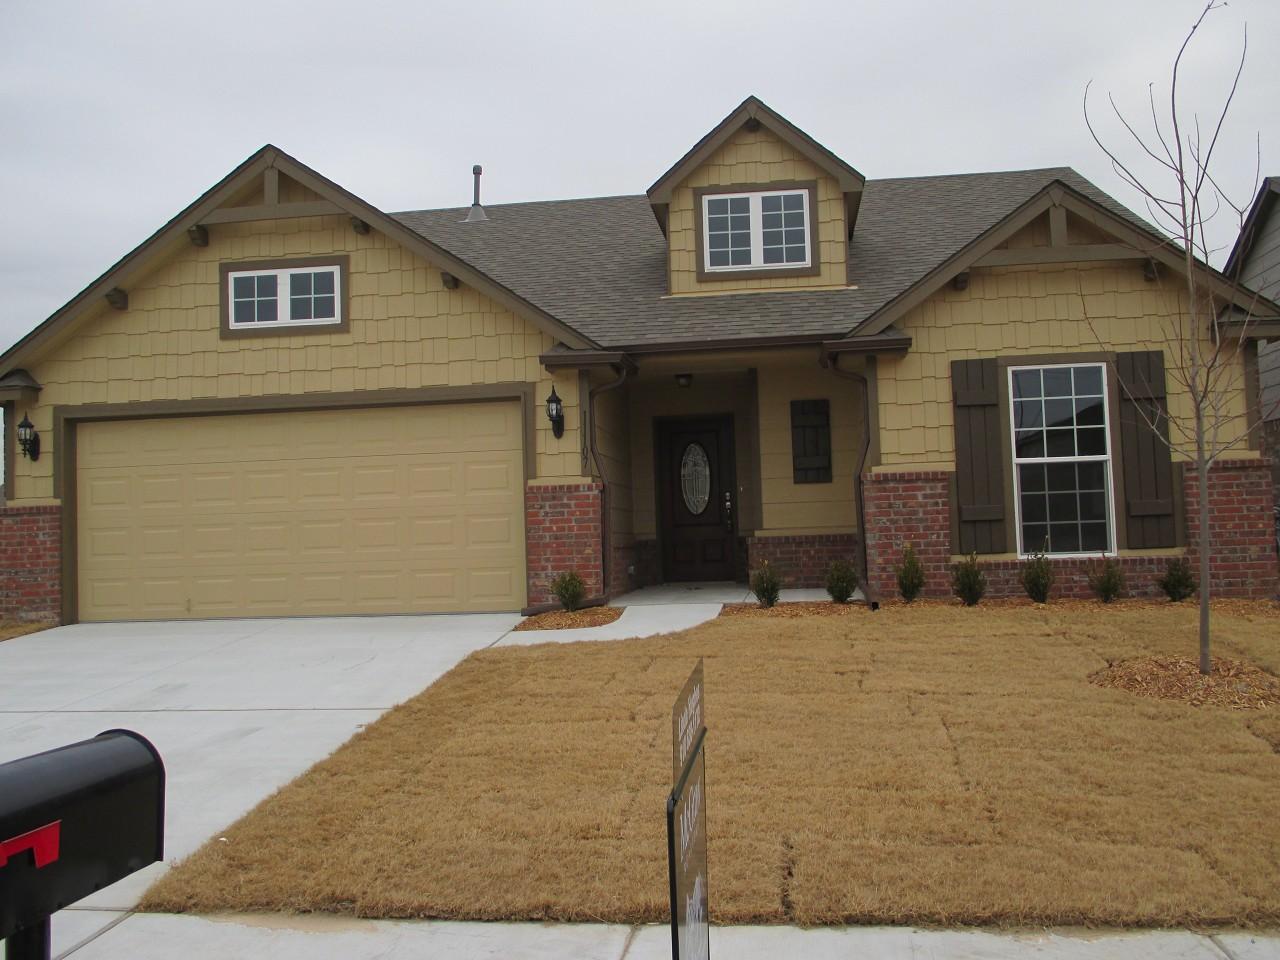 Single Family Home for Sale, ListingId:30933894, location: 11107 N 145th East Place Owasso 74055